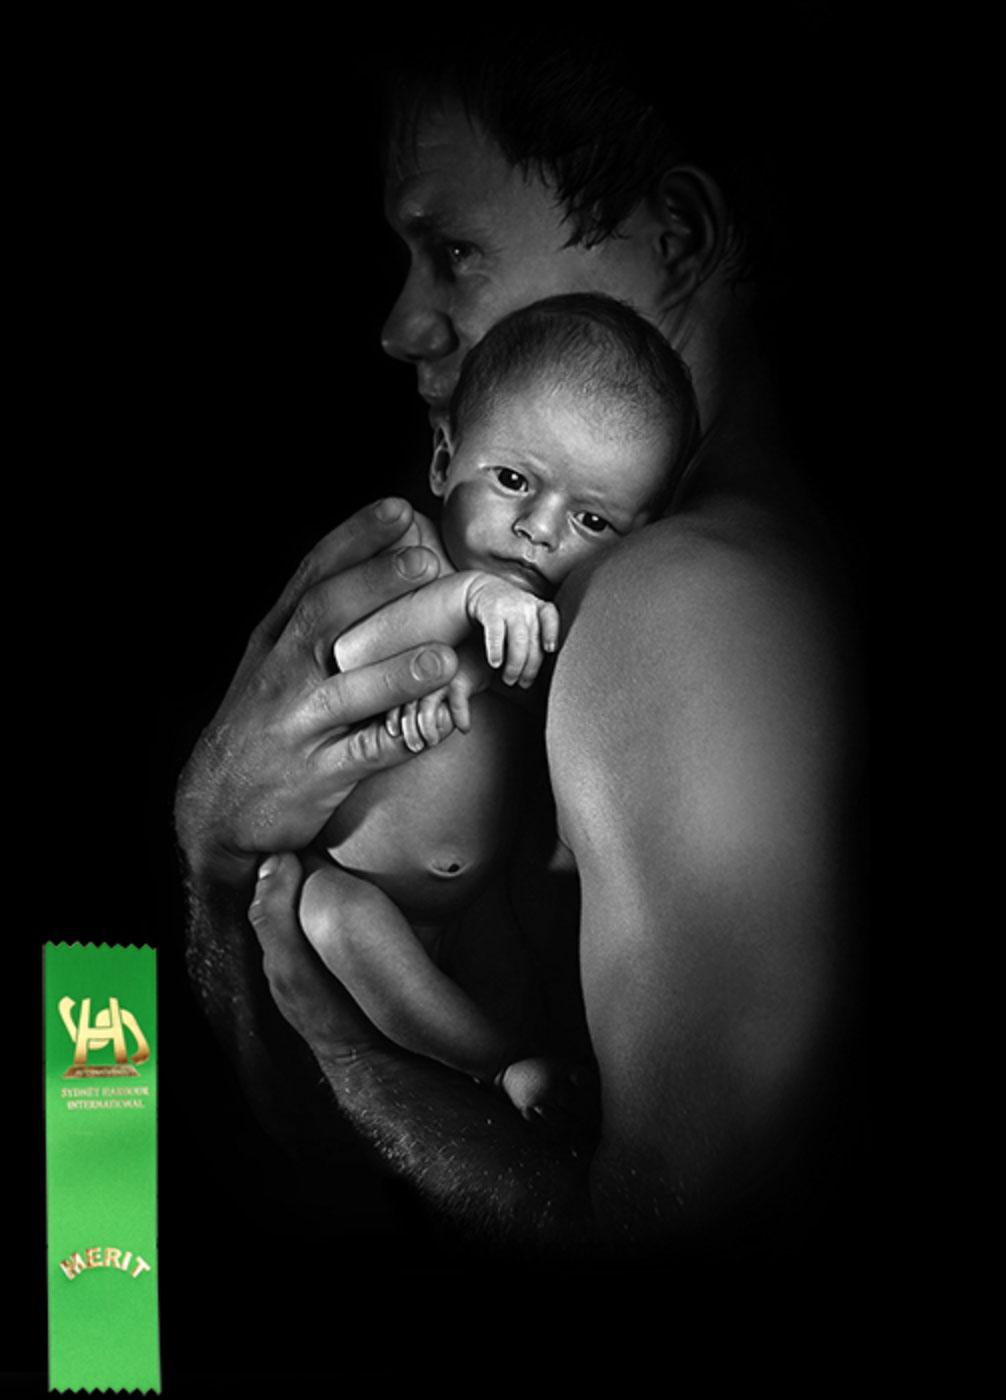 Sydney Harbour International 2015 (Australia) – Fatherhood – SH: Ribbon